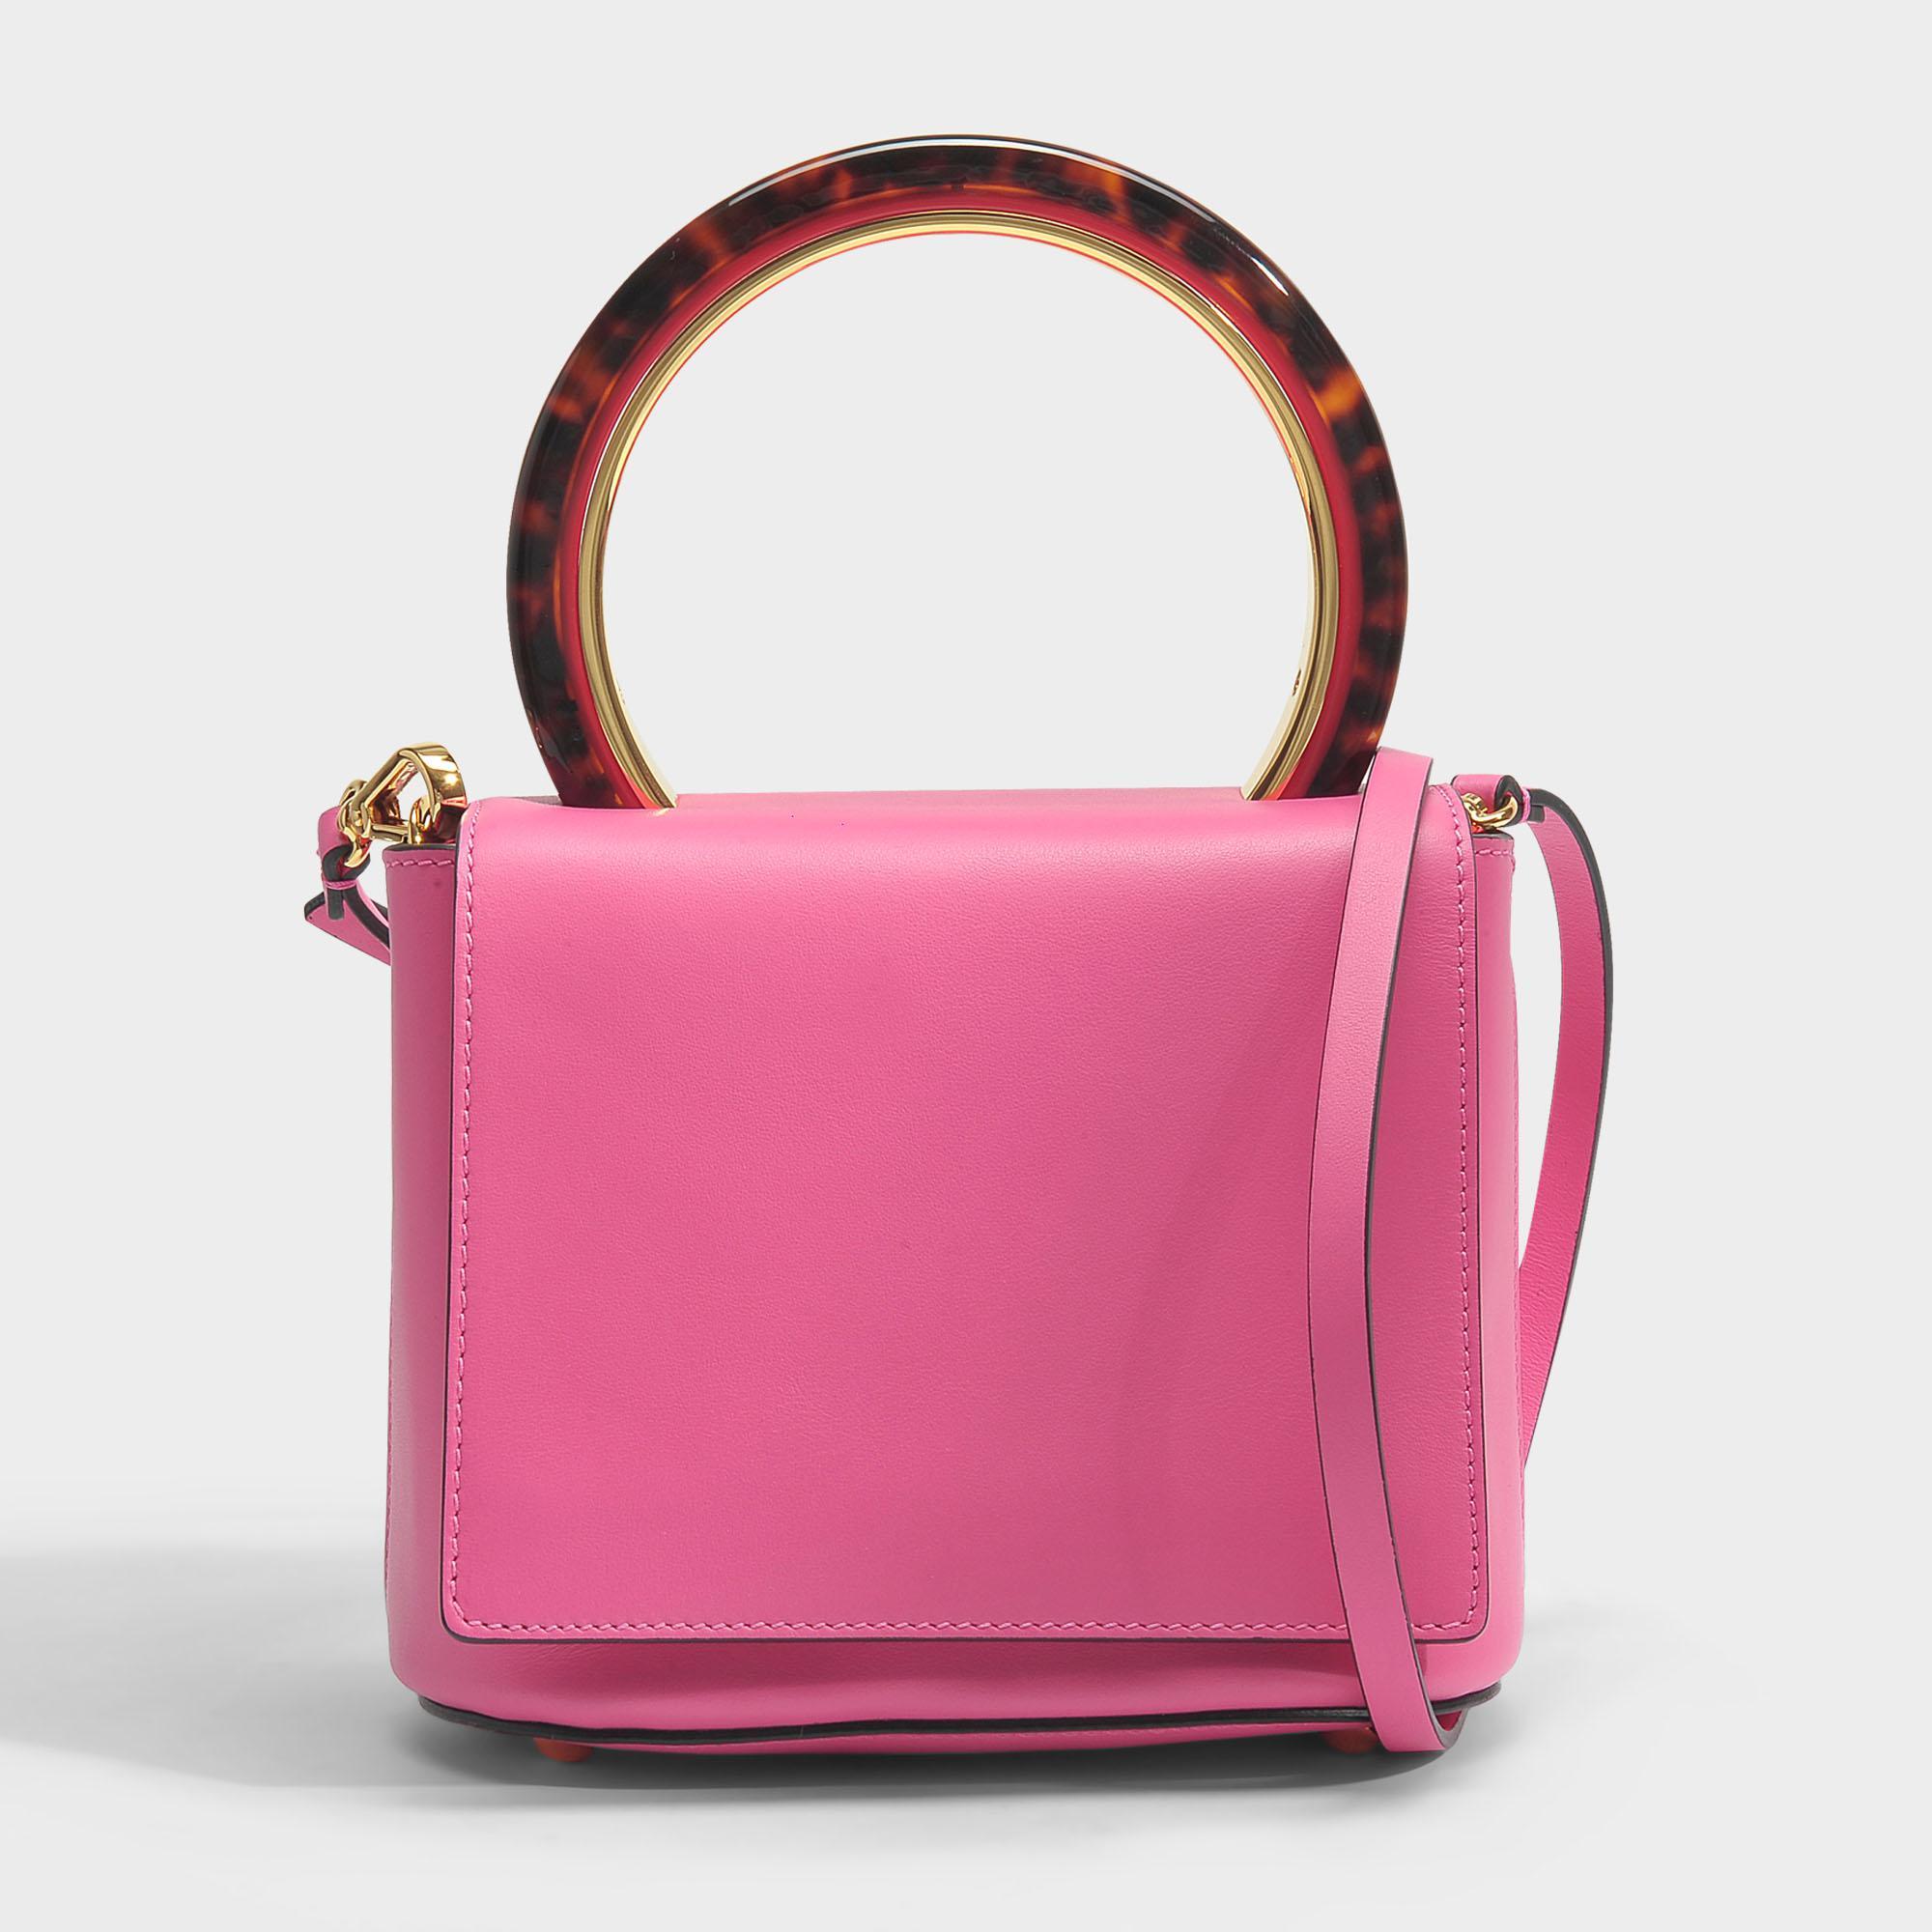 Marni Round Circle Flap Bag in Fuchsia Fluo Calf Leather tSZC4